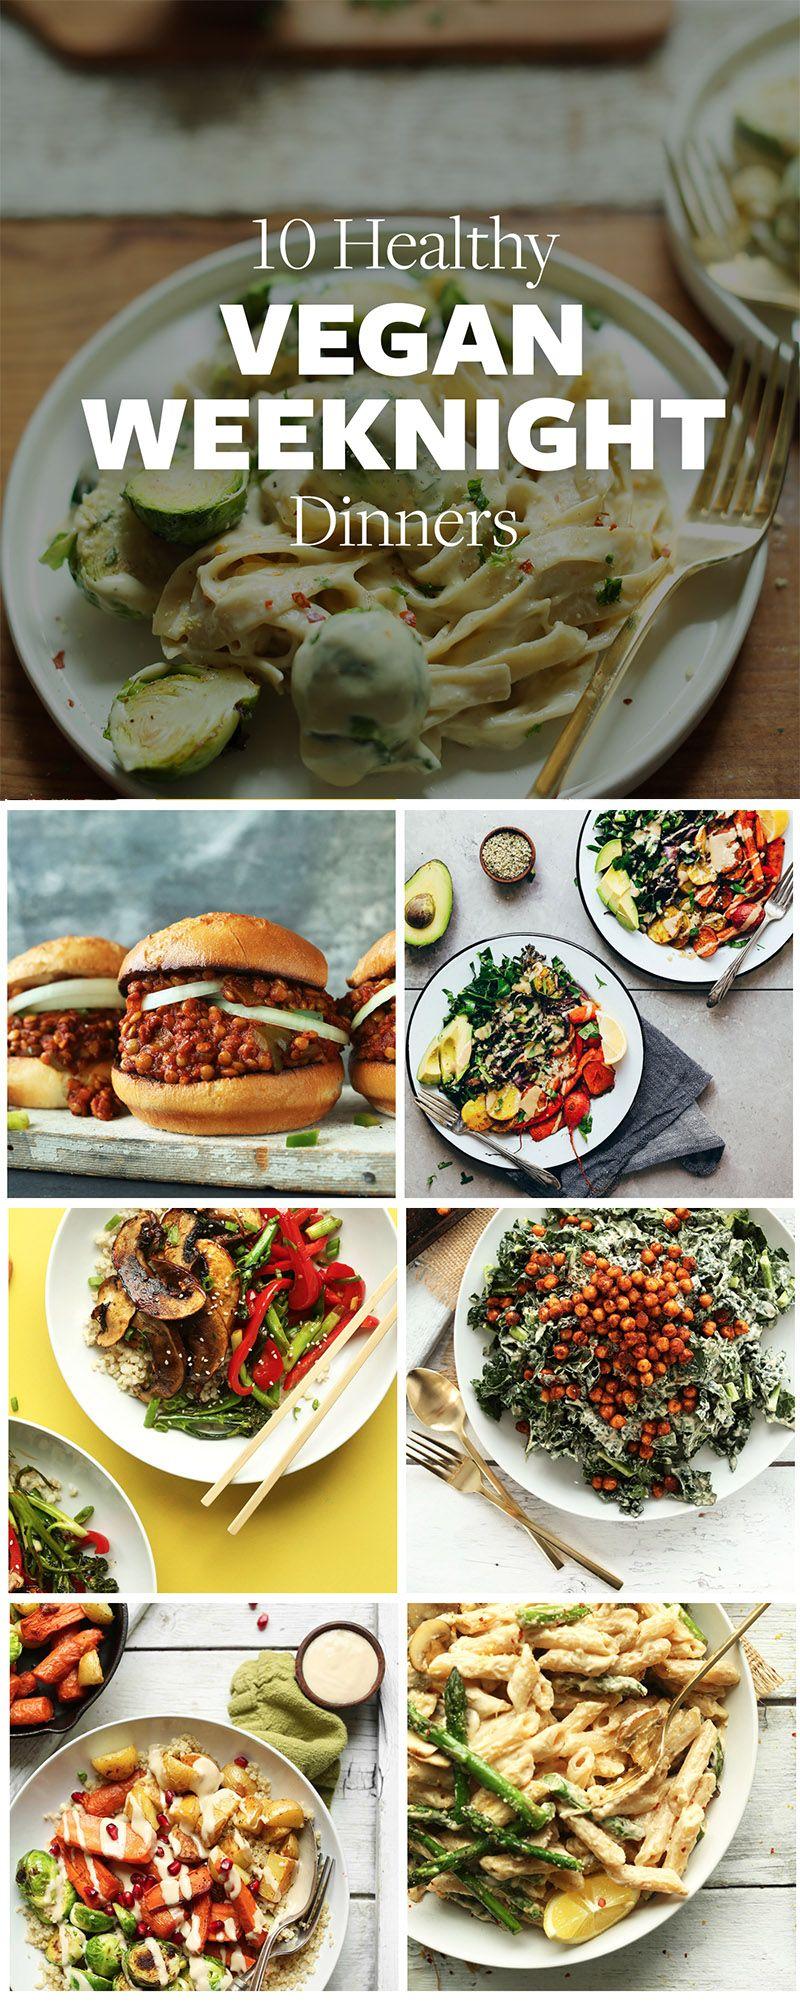 10 Healthy Vegan Dinners Minimalist Baker Recipes Healthy Vegan Dinner Vegetarian Vegan Recipes Vegan Dinners